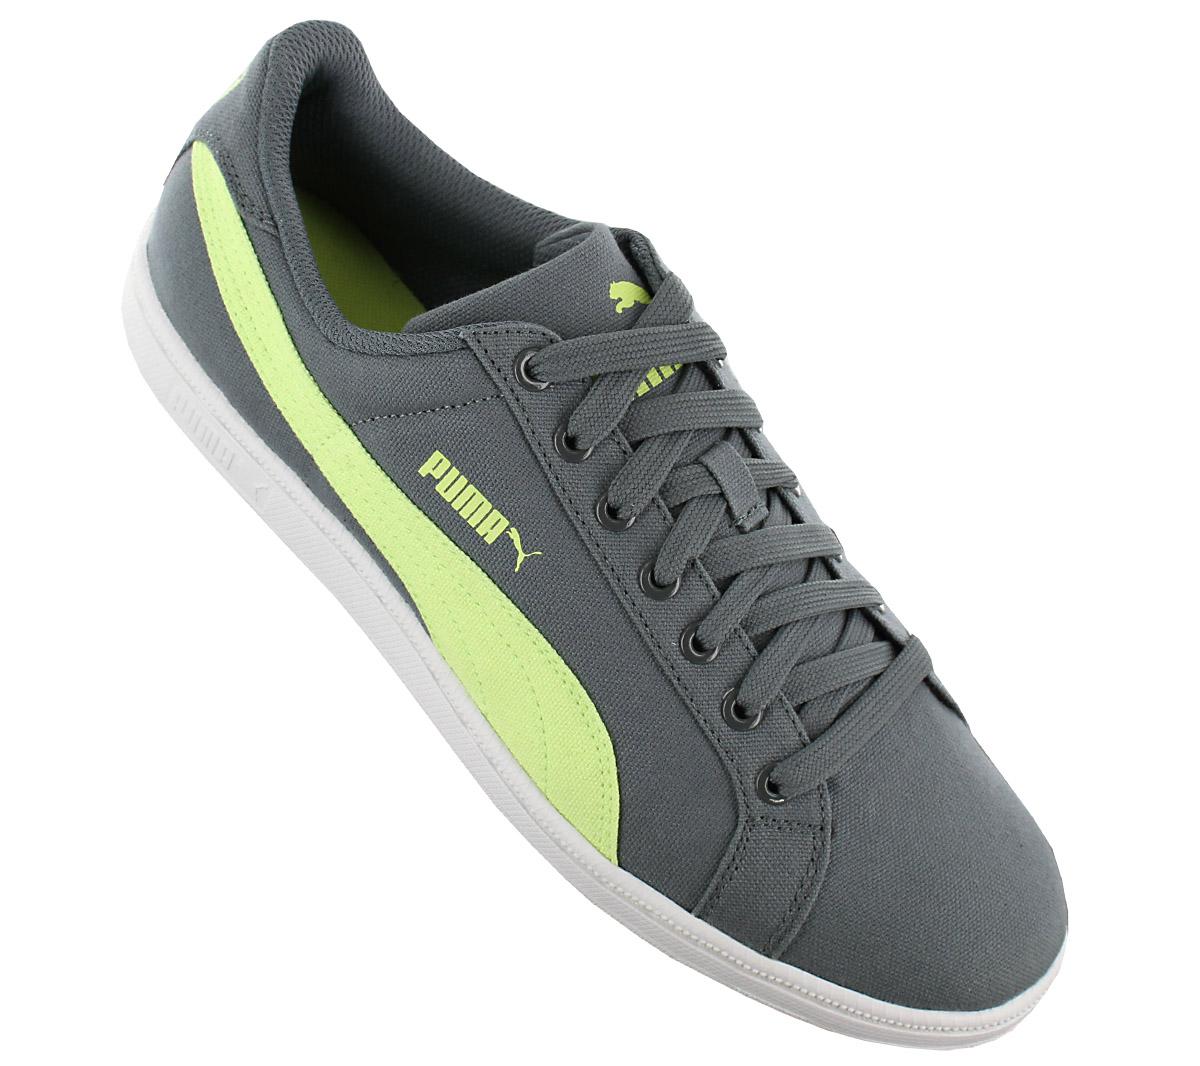 Details zu Puma Smash CV Herren Fashion Sneaker Schuhe Canvas Turnschuhe Grün 357583 04 NEU